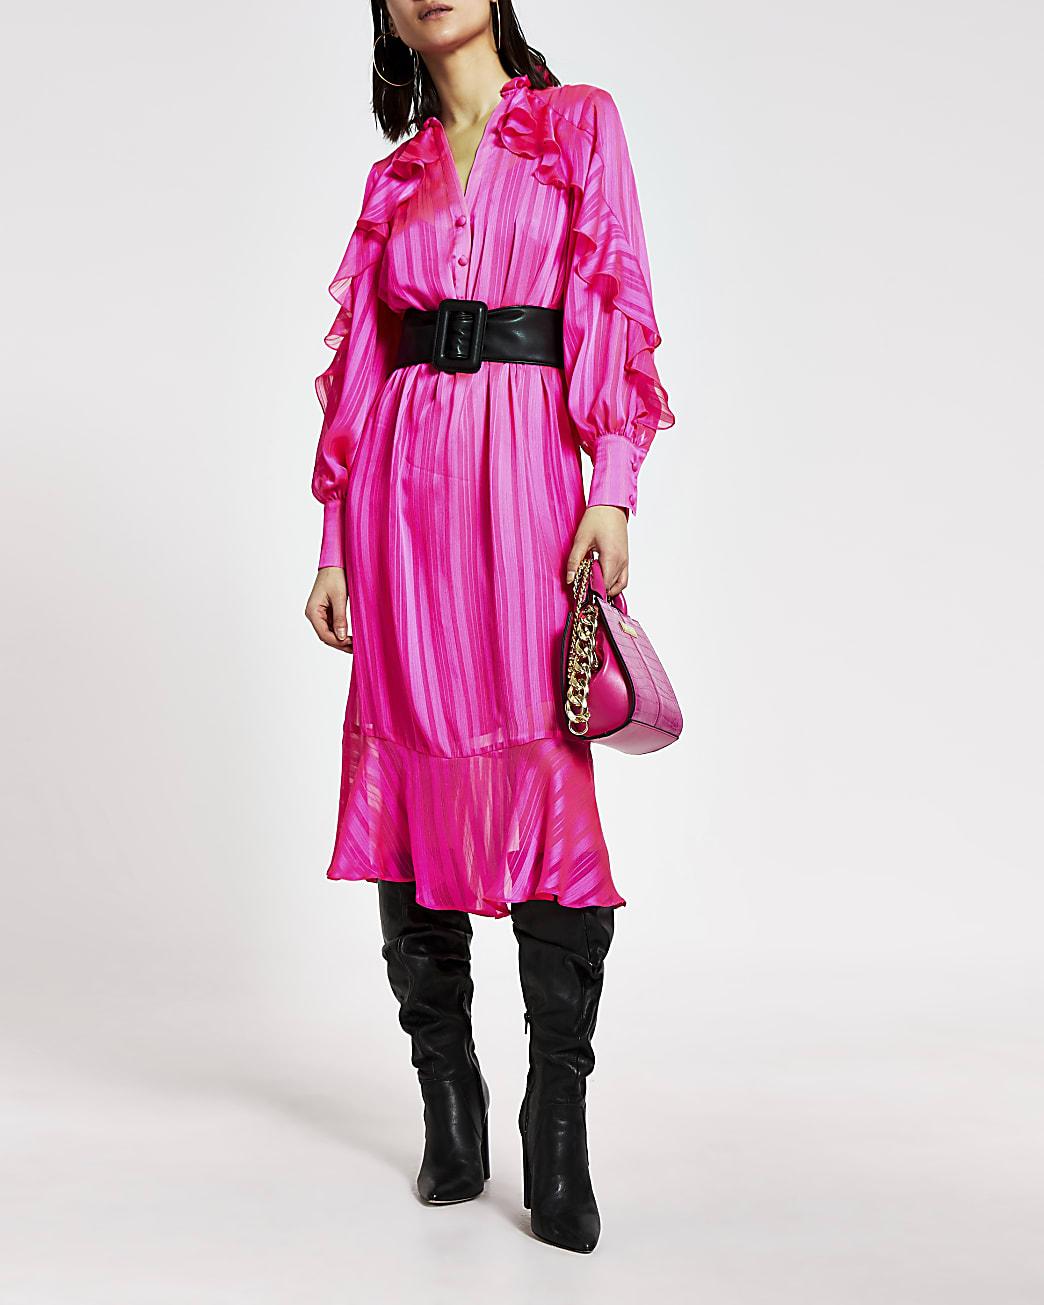 Bright pink ruffle tie belted midi dress